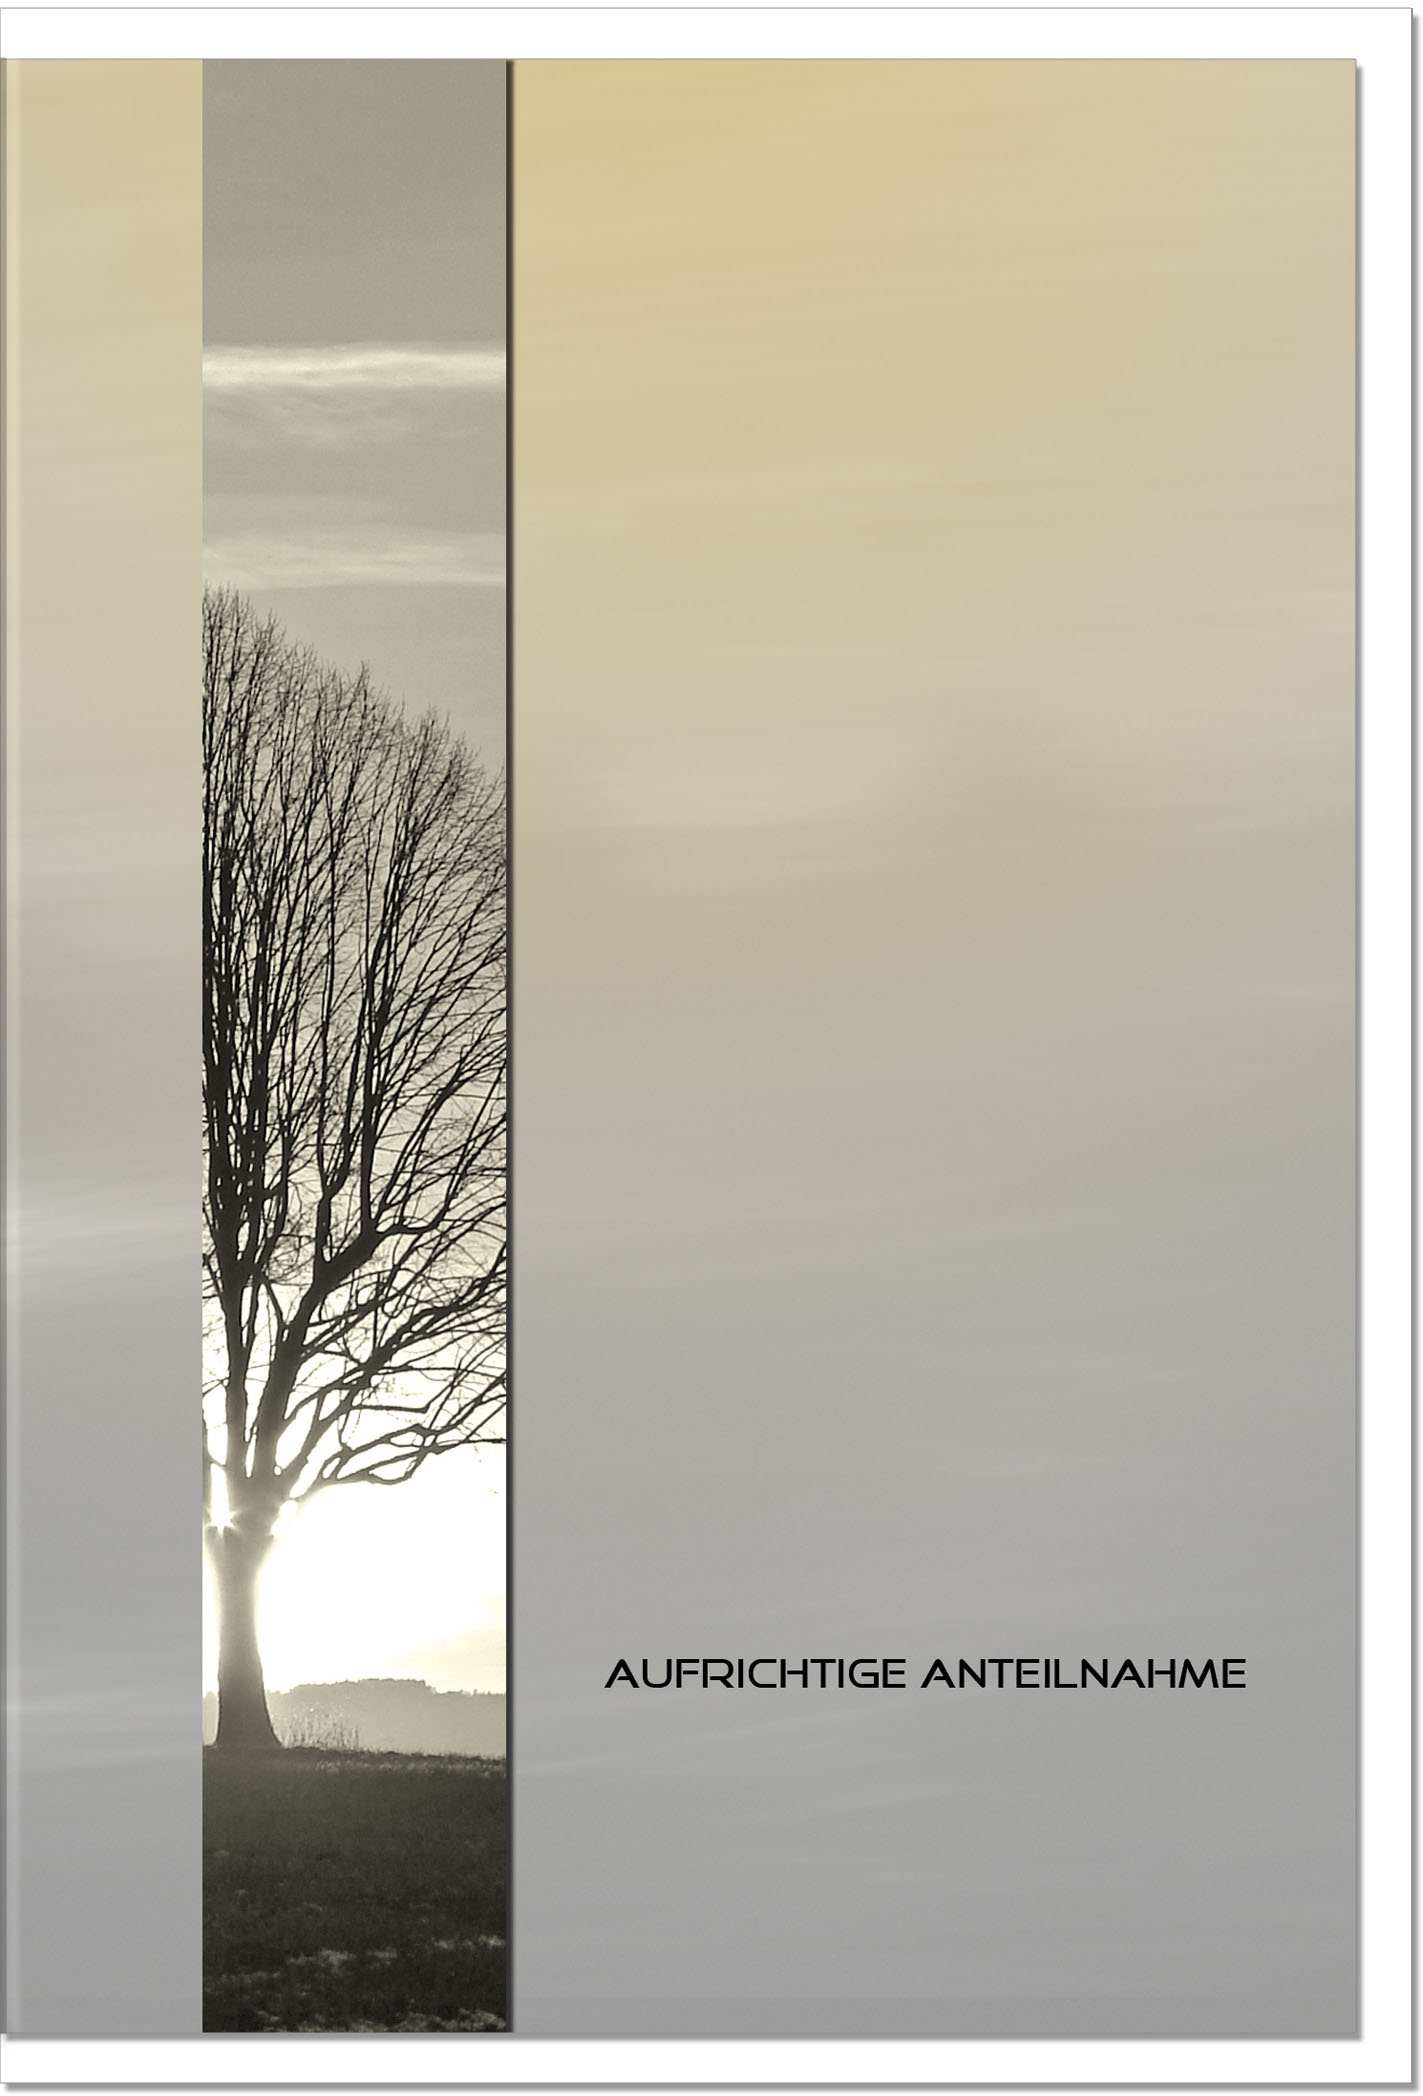 Trauerkarte Beileidskarte / Baum